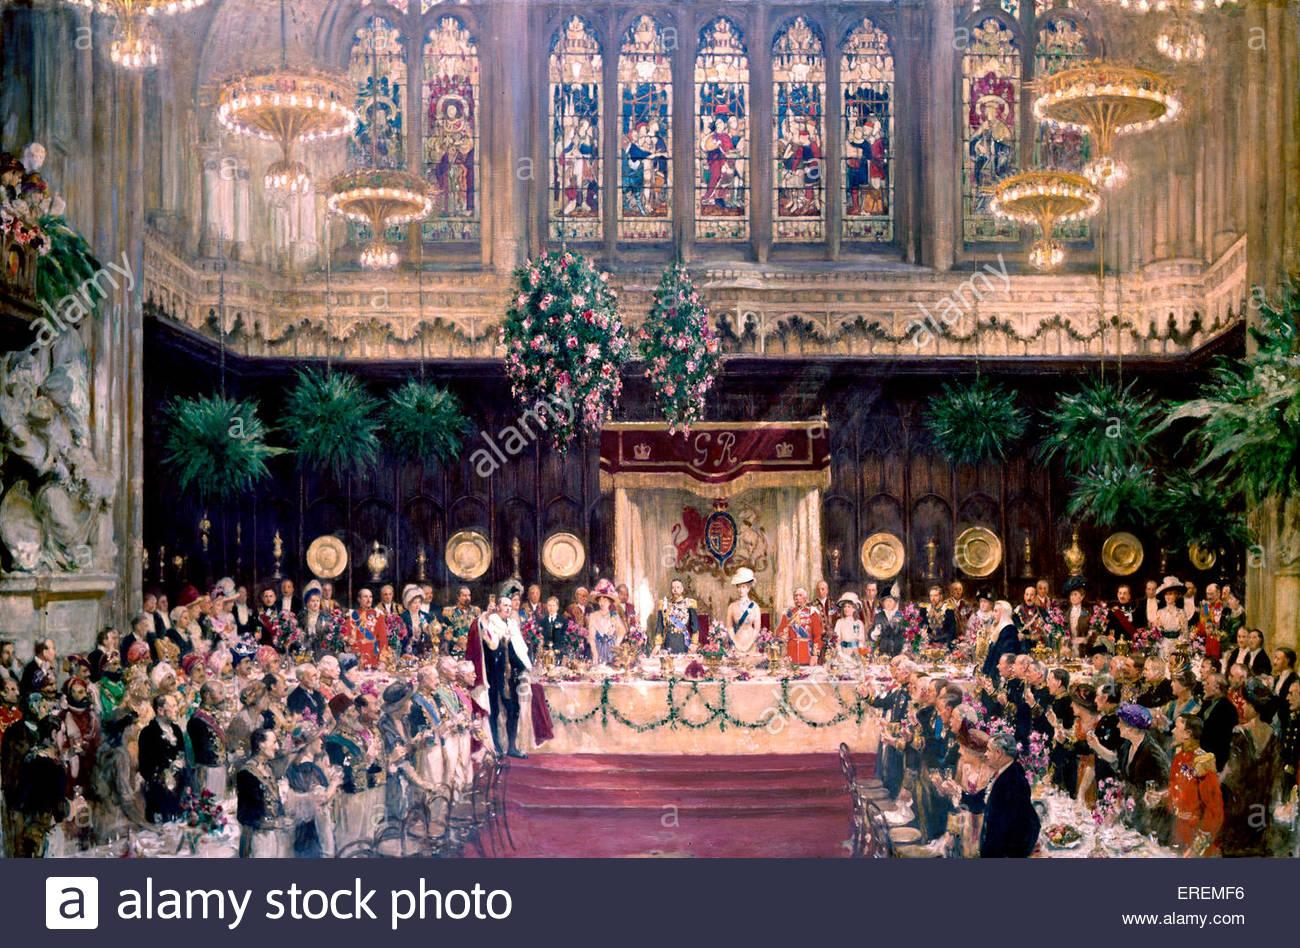 Coronation Luncheon by Solomon Joseph Solomon, British pre-Raphaelite painter (1860 - 1927). Luncheon marking coronation - Stock Image